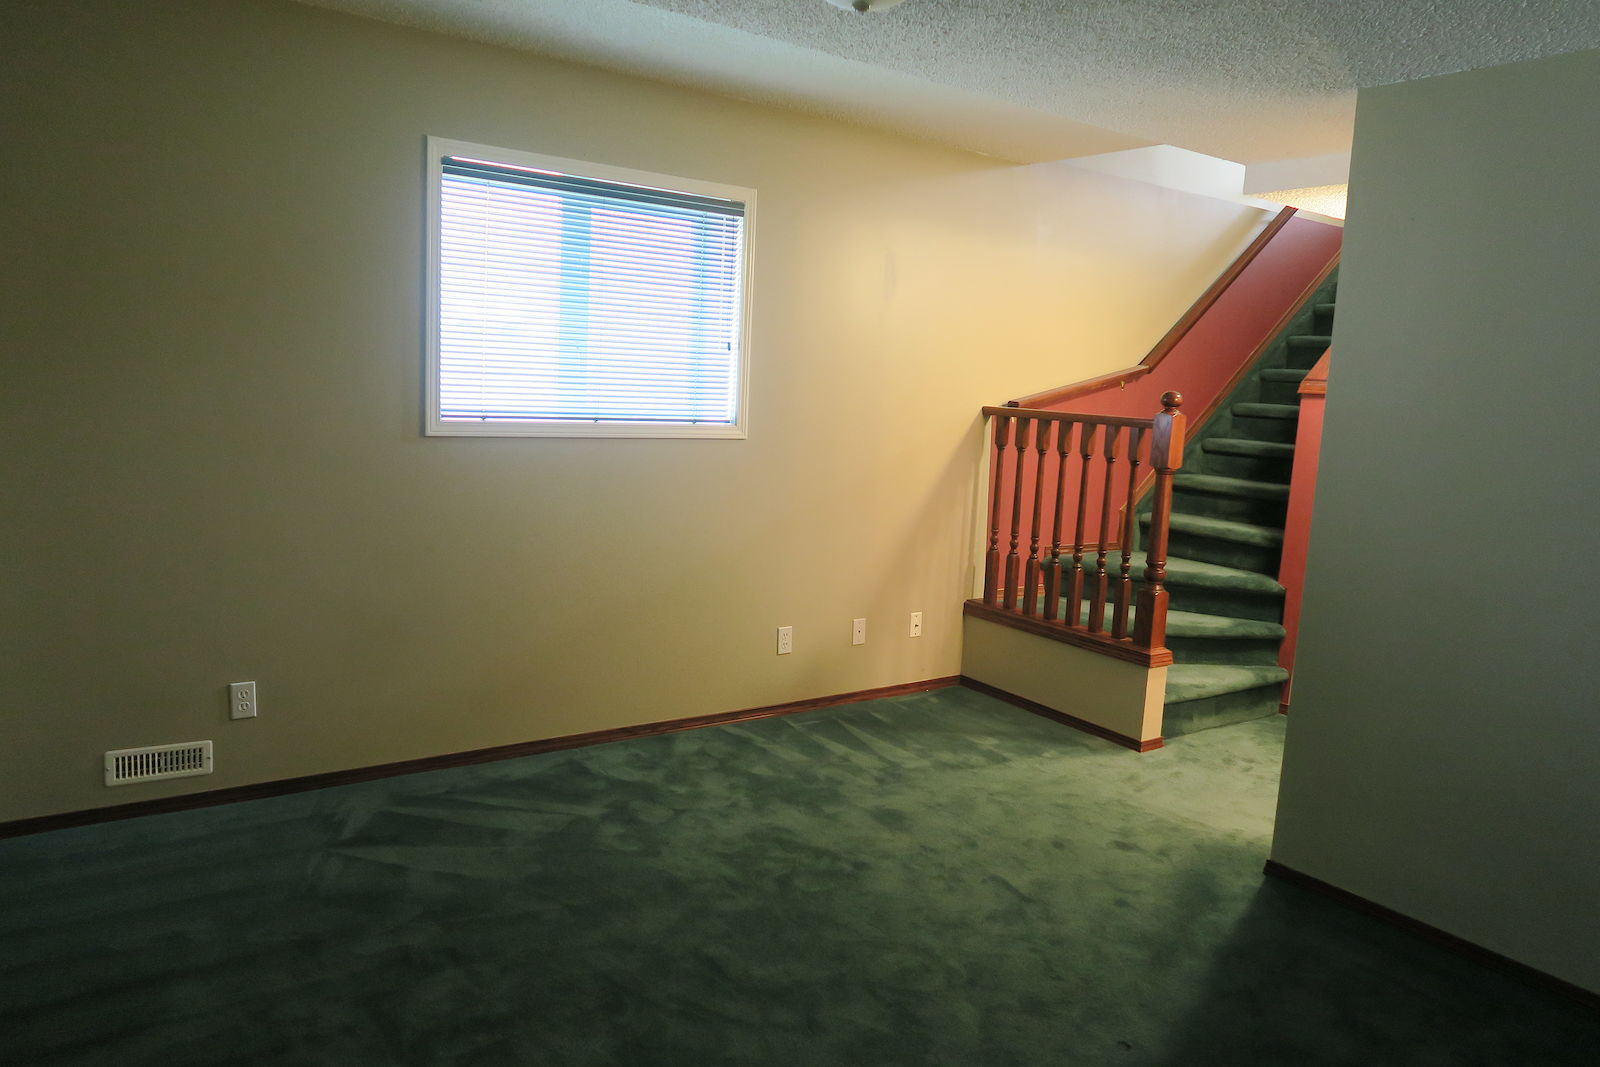 Calgary Townhouse For Rent Hamptons Full Developed Beautiful 3 Basement Wiring Rumplus Room